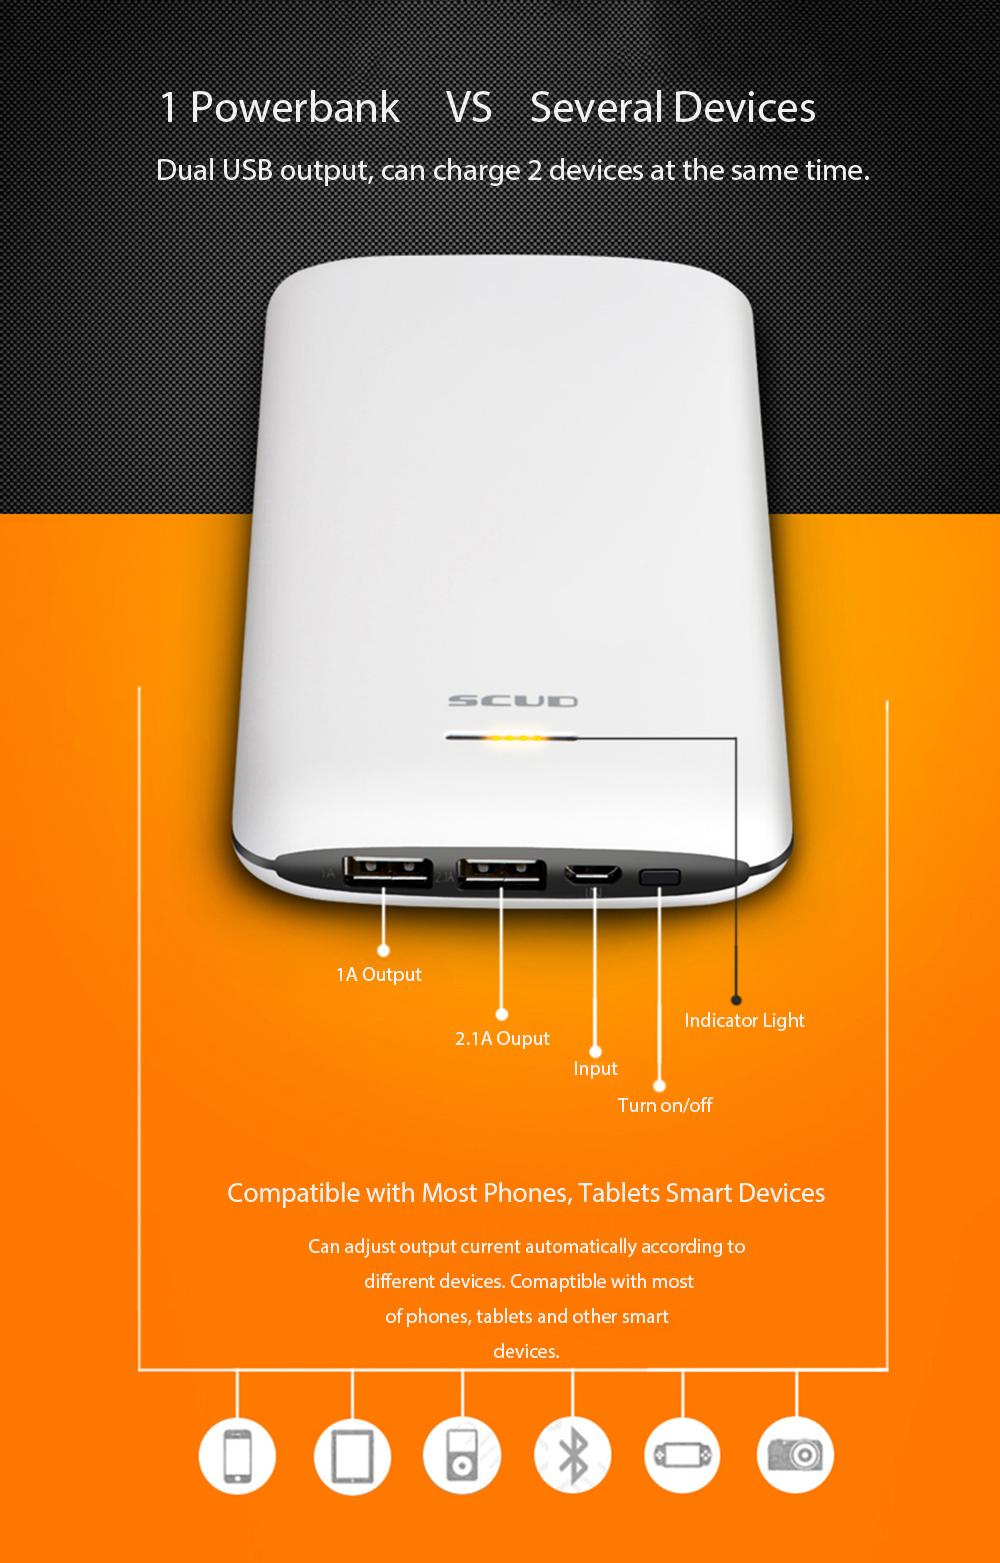 Original-Scud-20000mAh-Dual-USB-Power-Bank-External-Battery-Charger-Backup-For-iPhone-6s-7-Plus-Xiaomi-Phone-Tablet-Powerbank- (3)